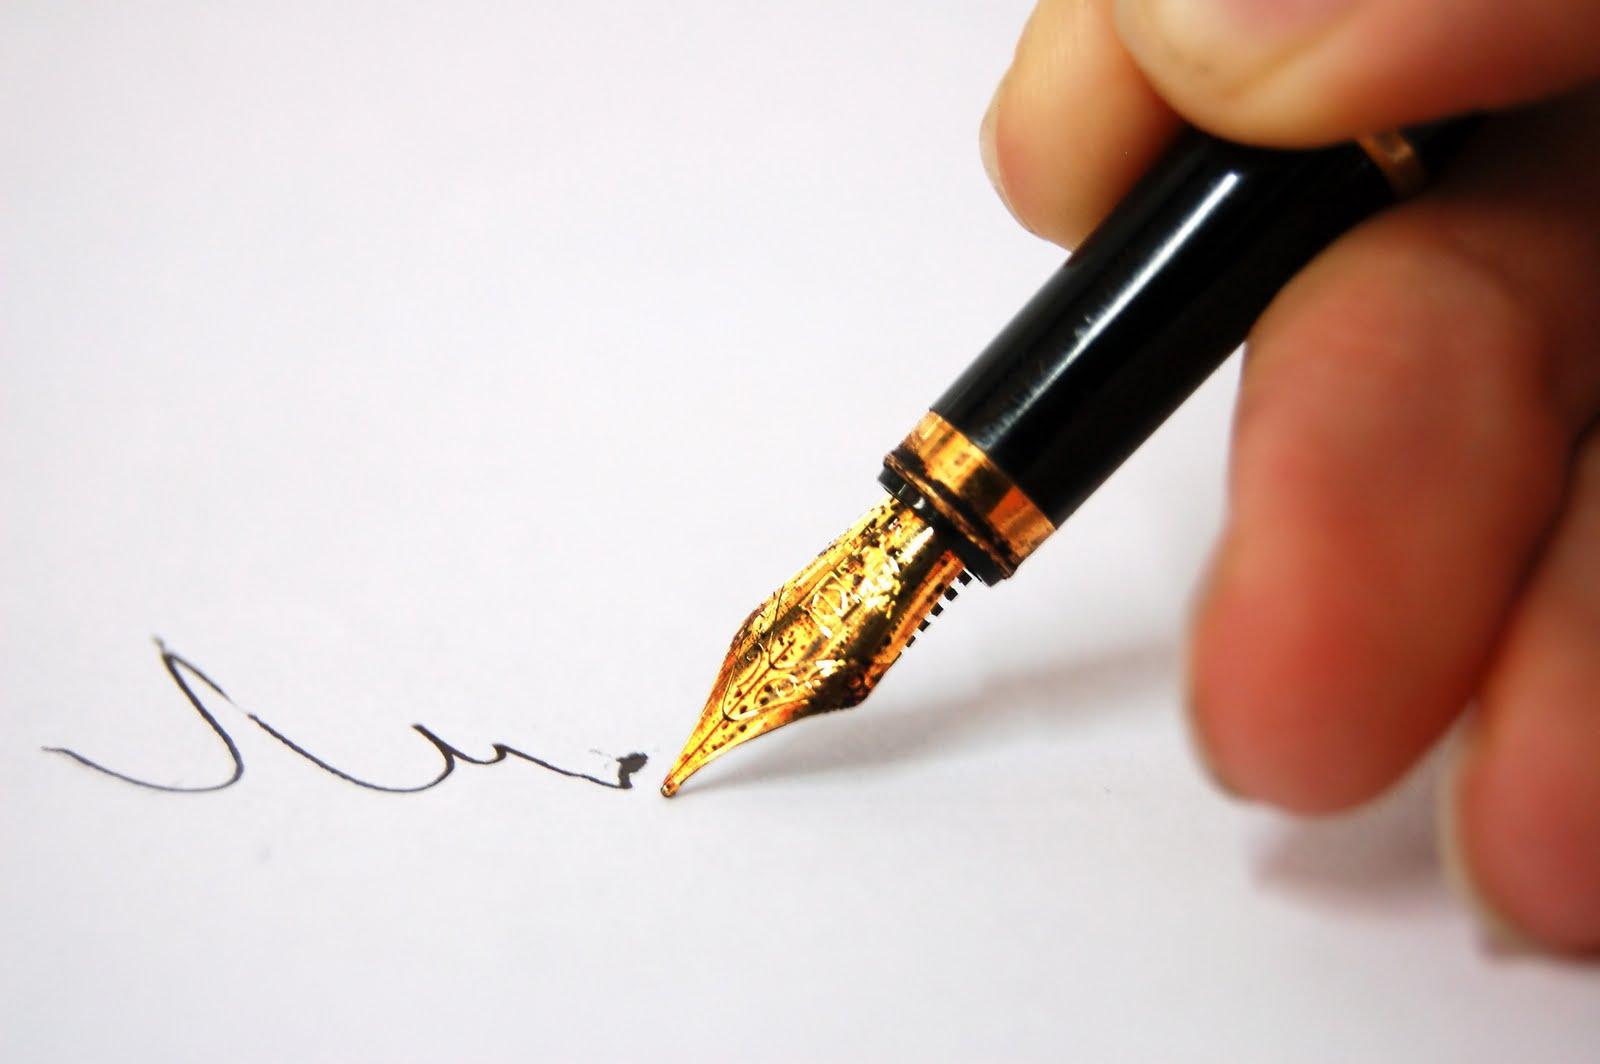 10 lines on pen